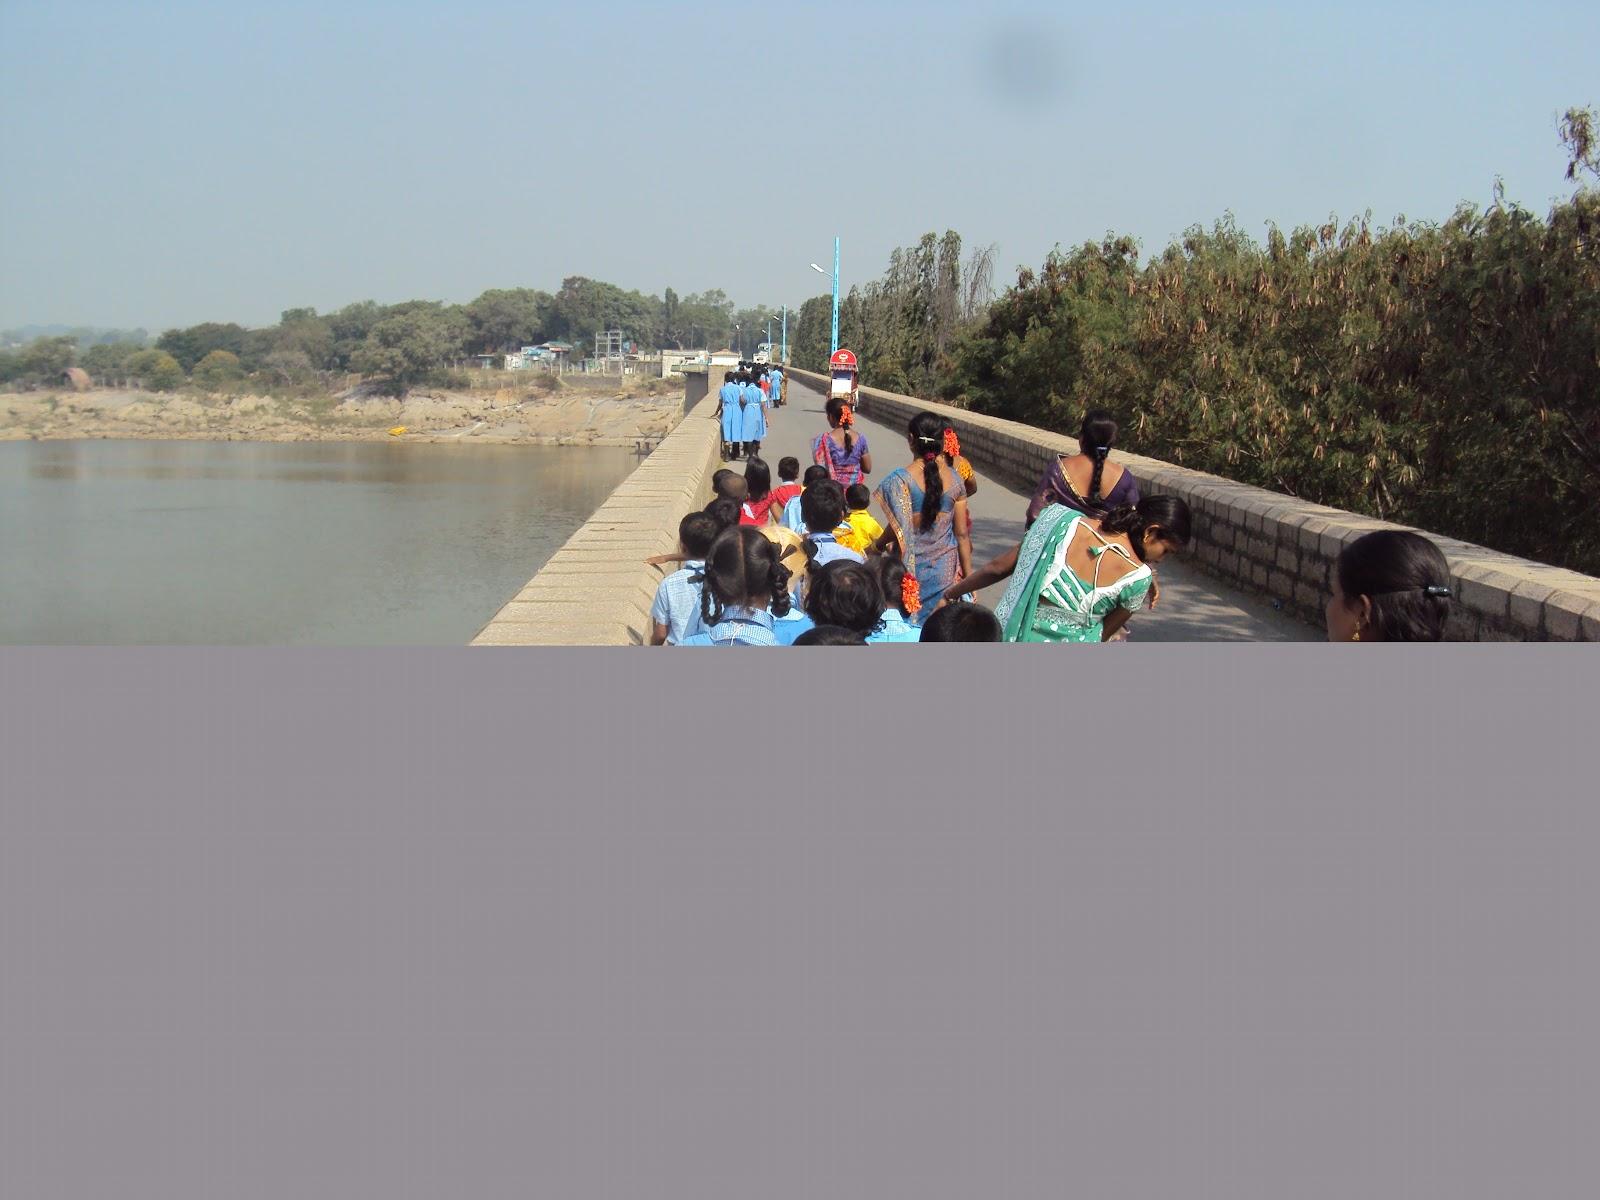 vihara yathra Maa andhra pradesh yatralu: home andhra pradesh north india tours east india tours west india tours south india tours andhra pradesh tours our tours 01 south india tour 02 bhadrachalam tour 03 karim nagar tour 04 konark tour 05 guntur tour 06 medak tour 07.